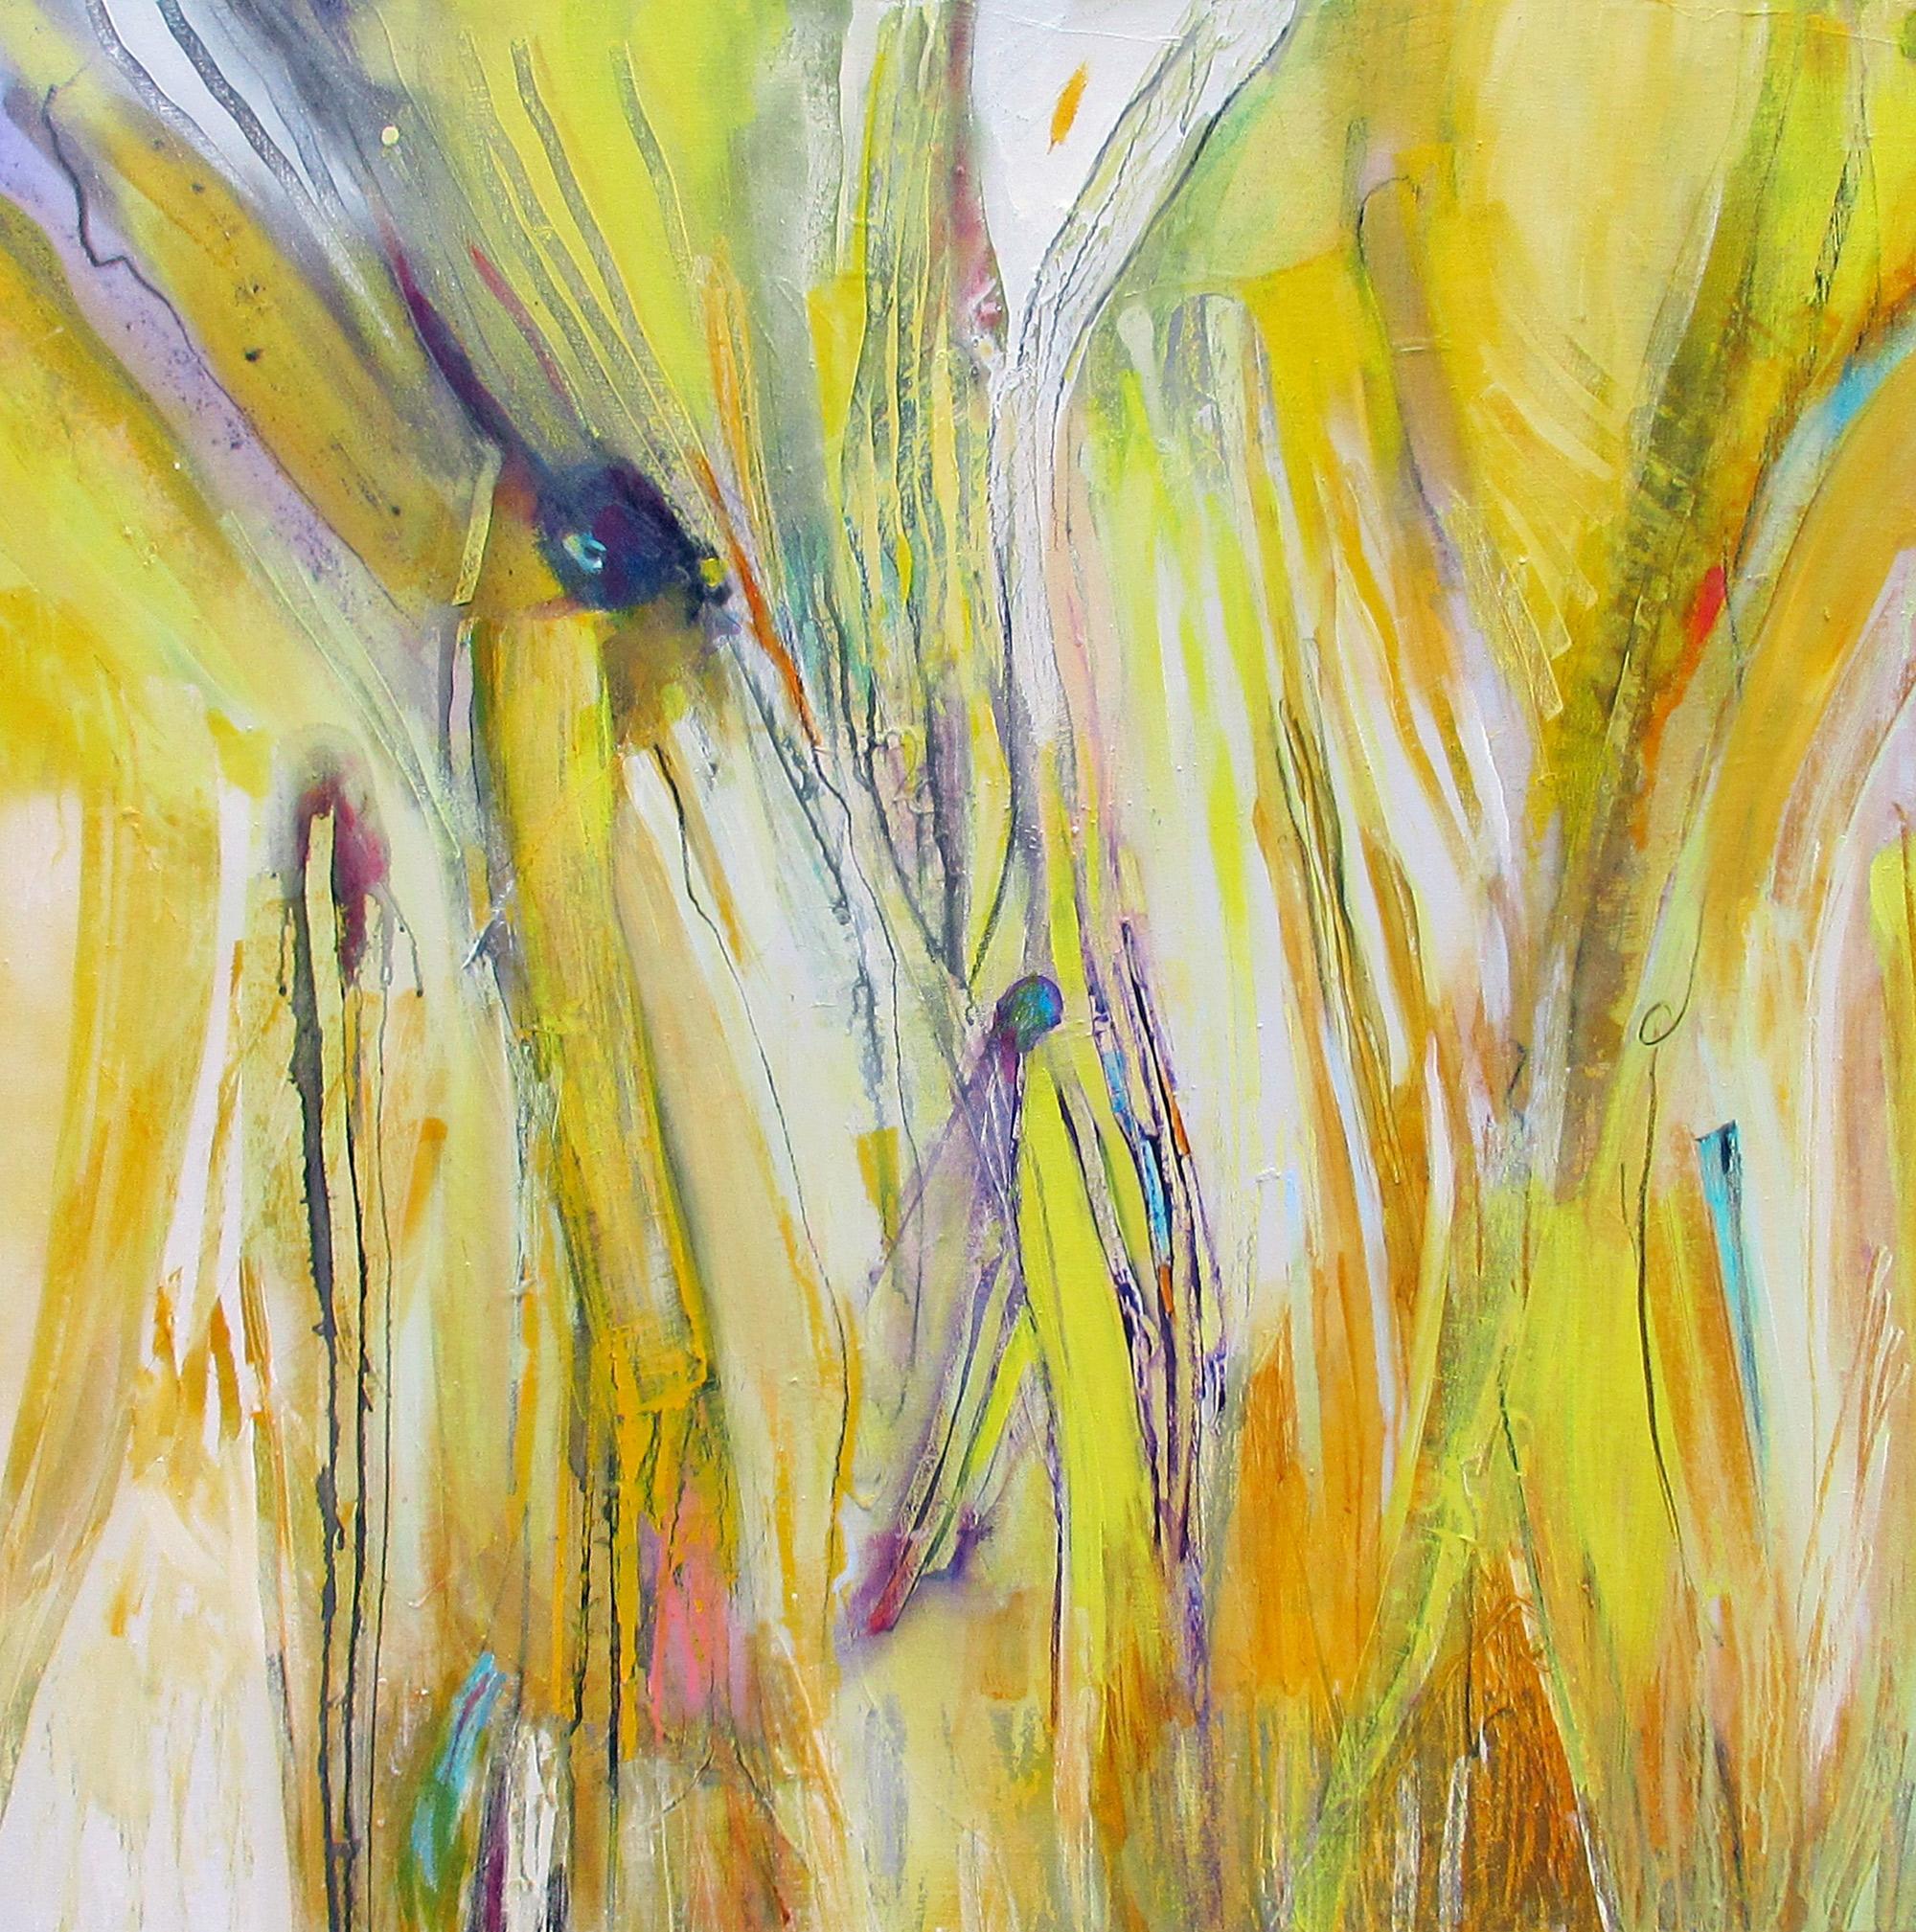 Artwork for large space – ArtfulPrint